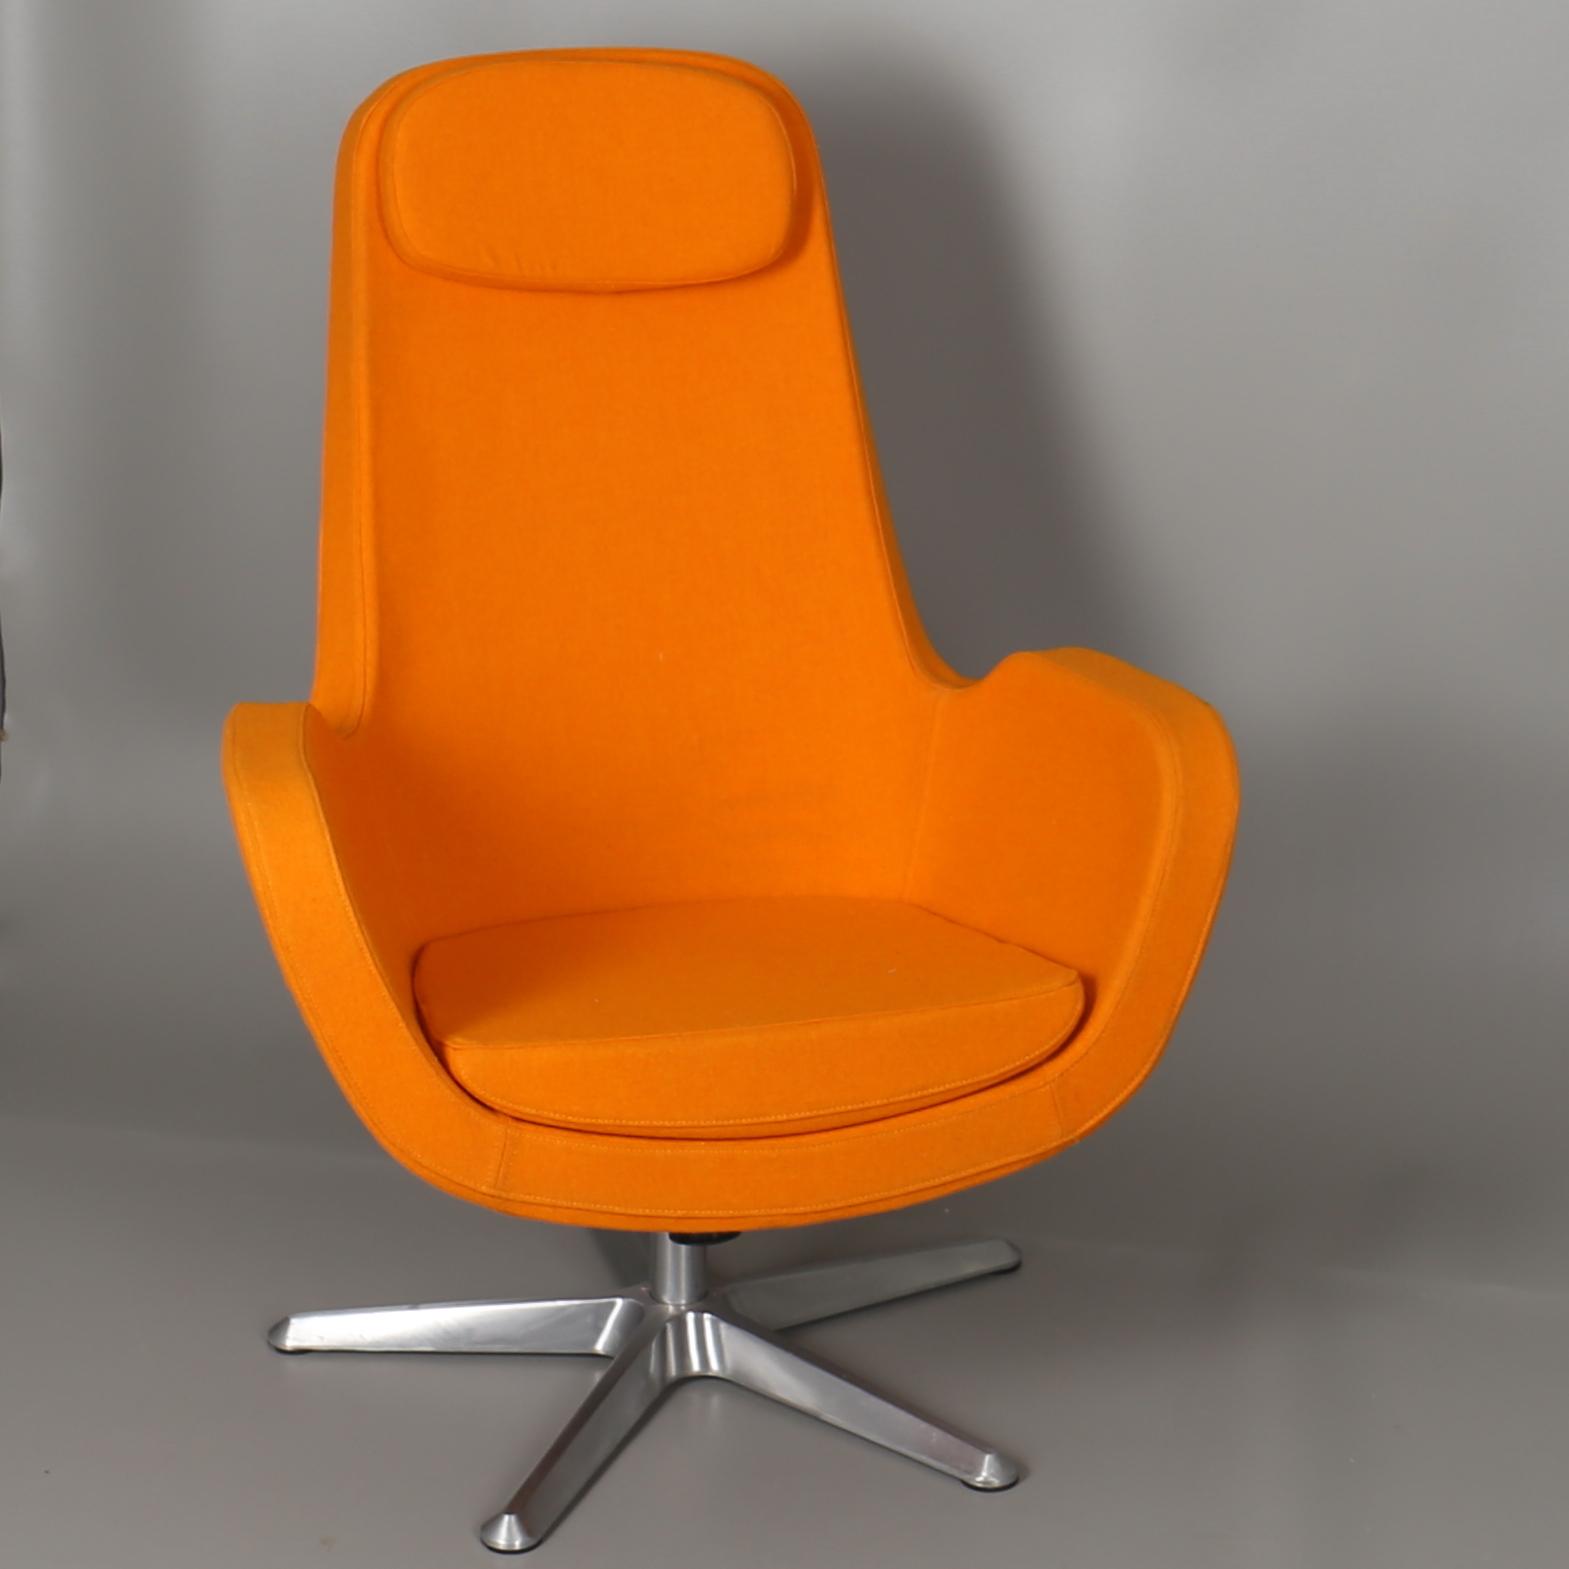 FÅtÖlj I Orange Tyg Snurrfåtölj Karlstad Ikea 2010 Tal Furniture Armchairs Chairs Auctionet